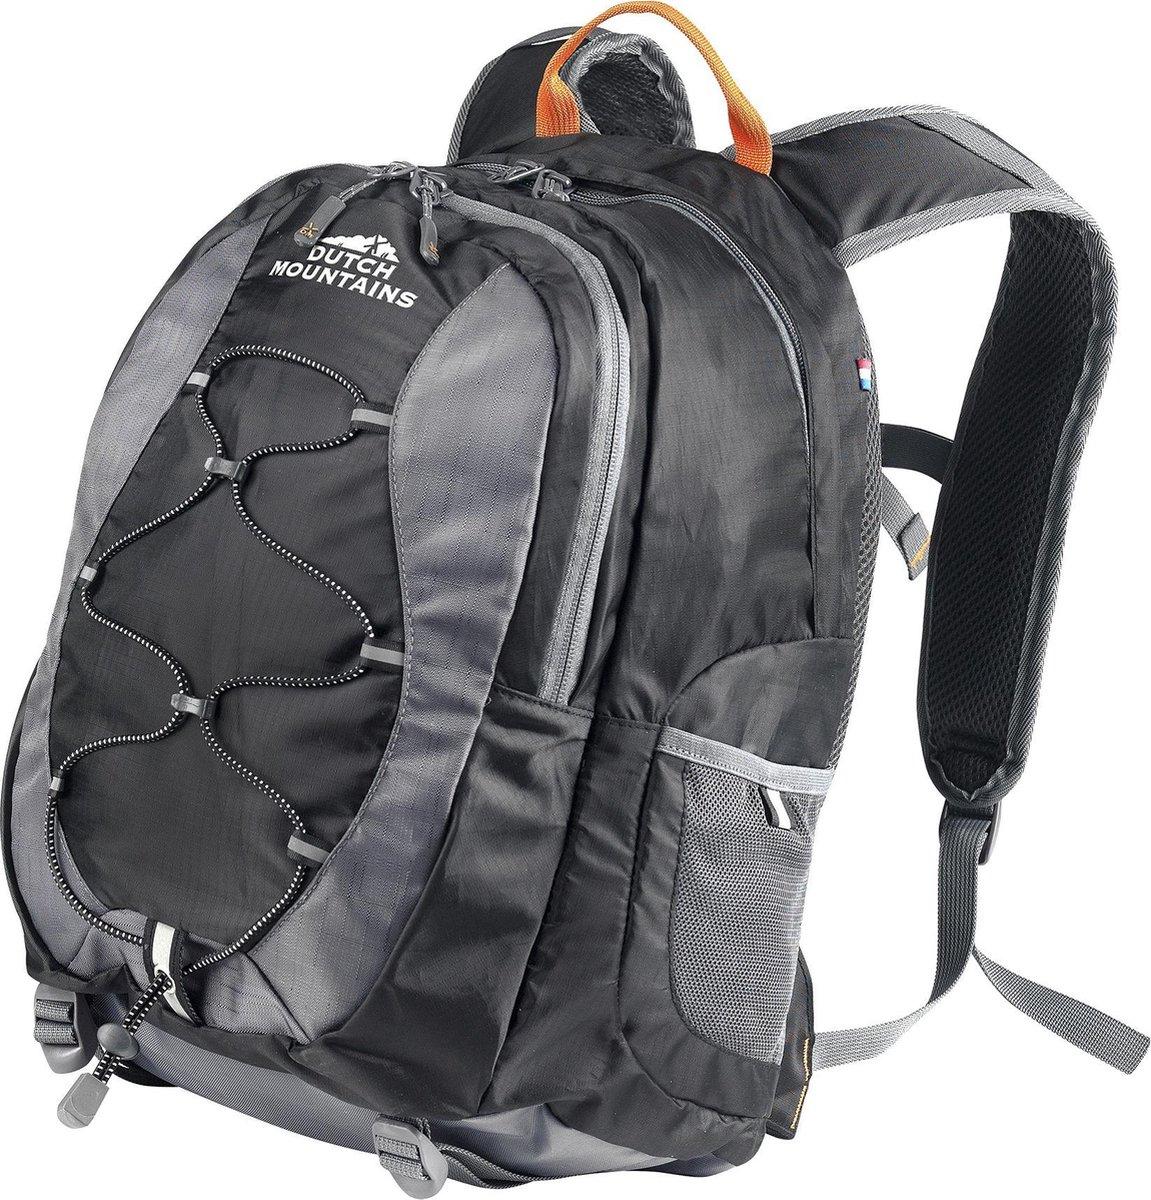 Dutch Mountains   Hunze  Backpack - Lichtgewicht Rugzak - Ingebouwde regenhoes - 18 Liter